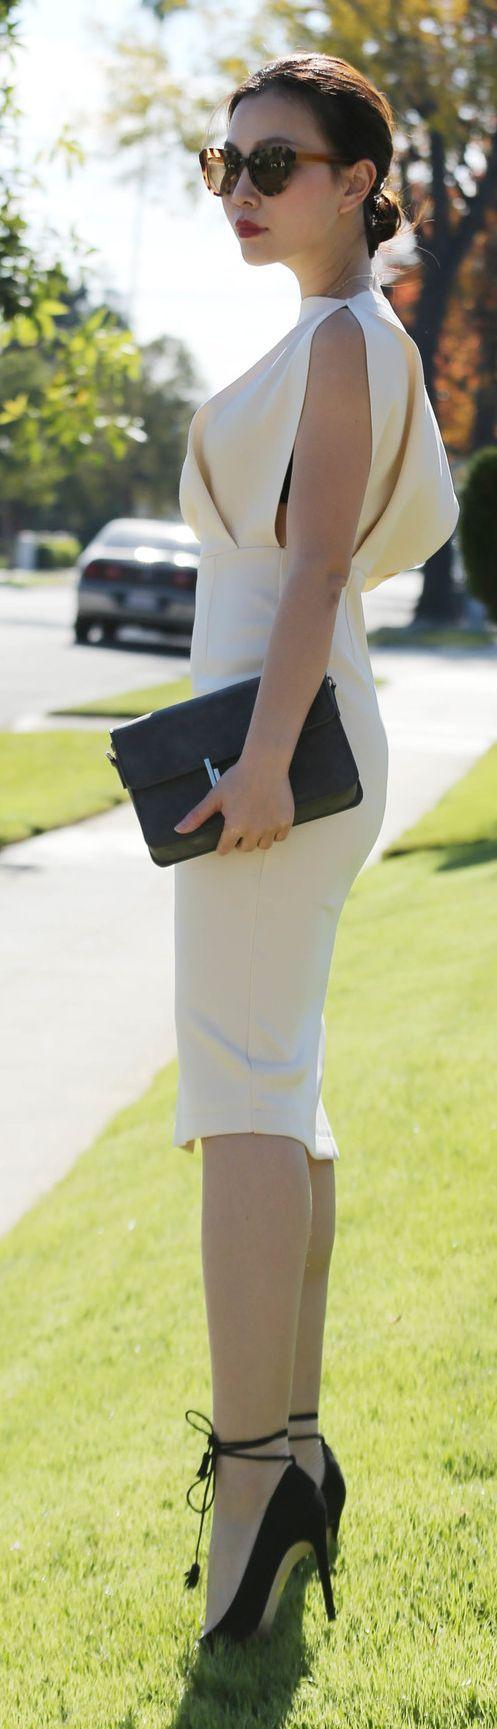 Elegant white dress # High Heels